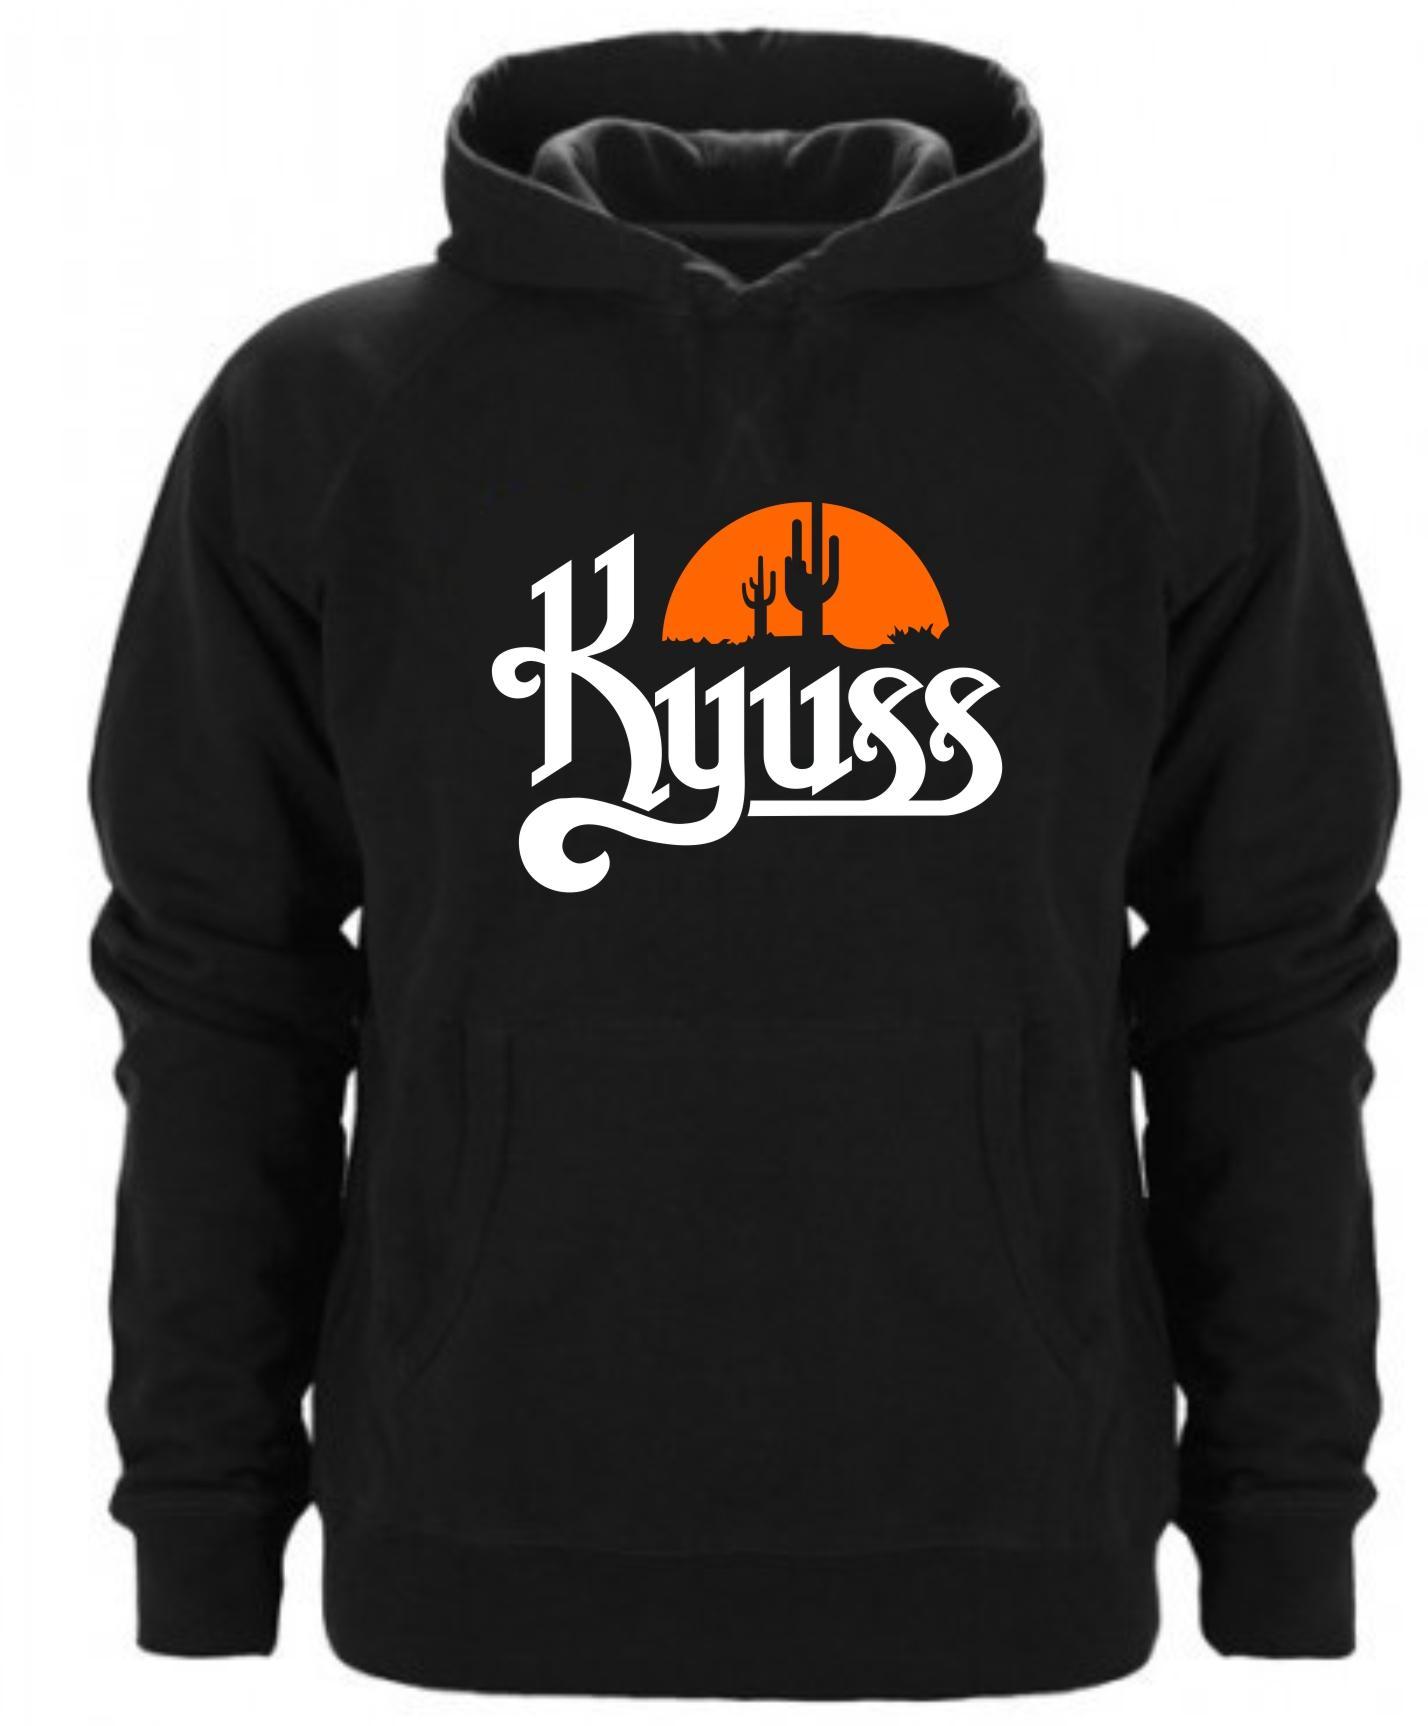 Sudadera Capucha Kyuss